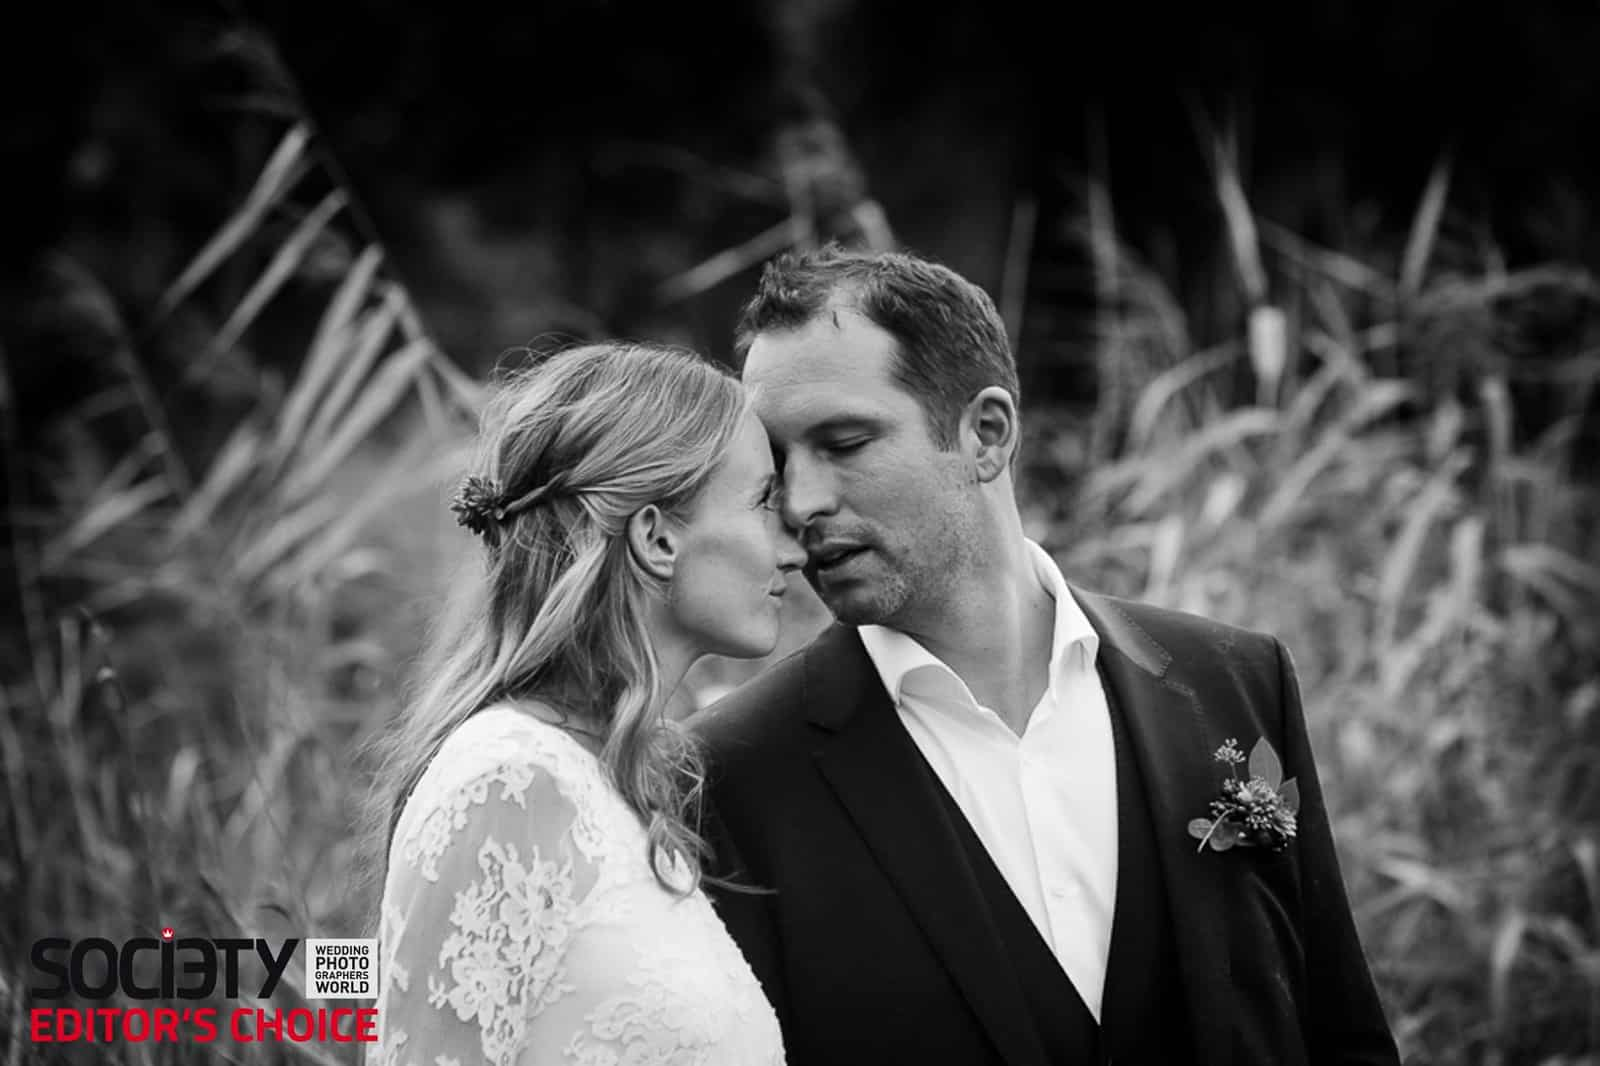 wedding-photographer-society-editors-choice-01